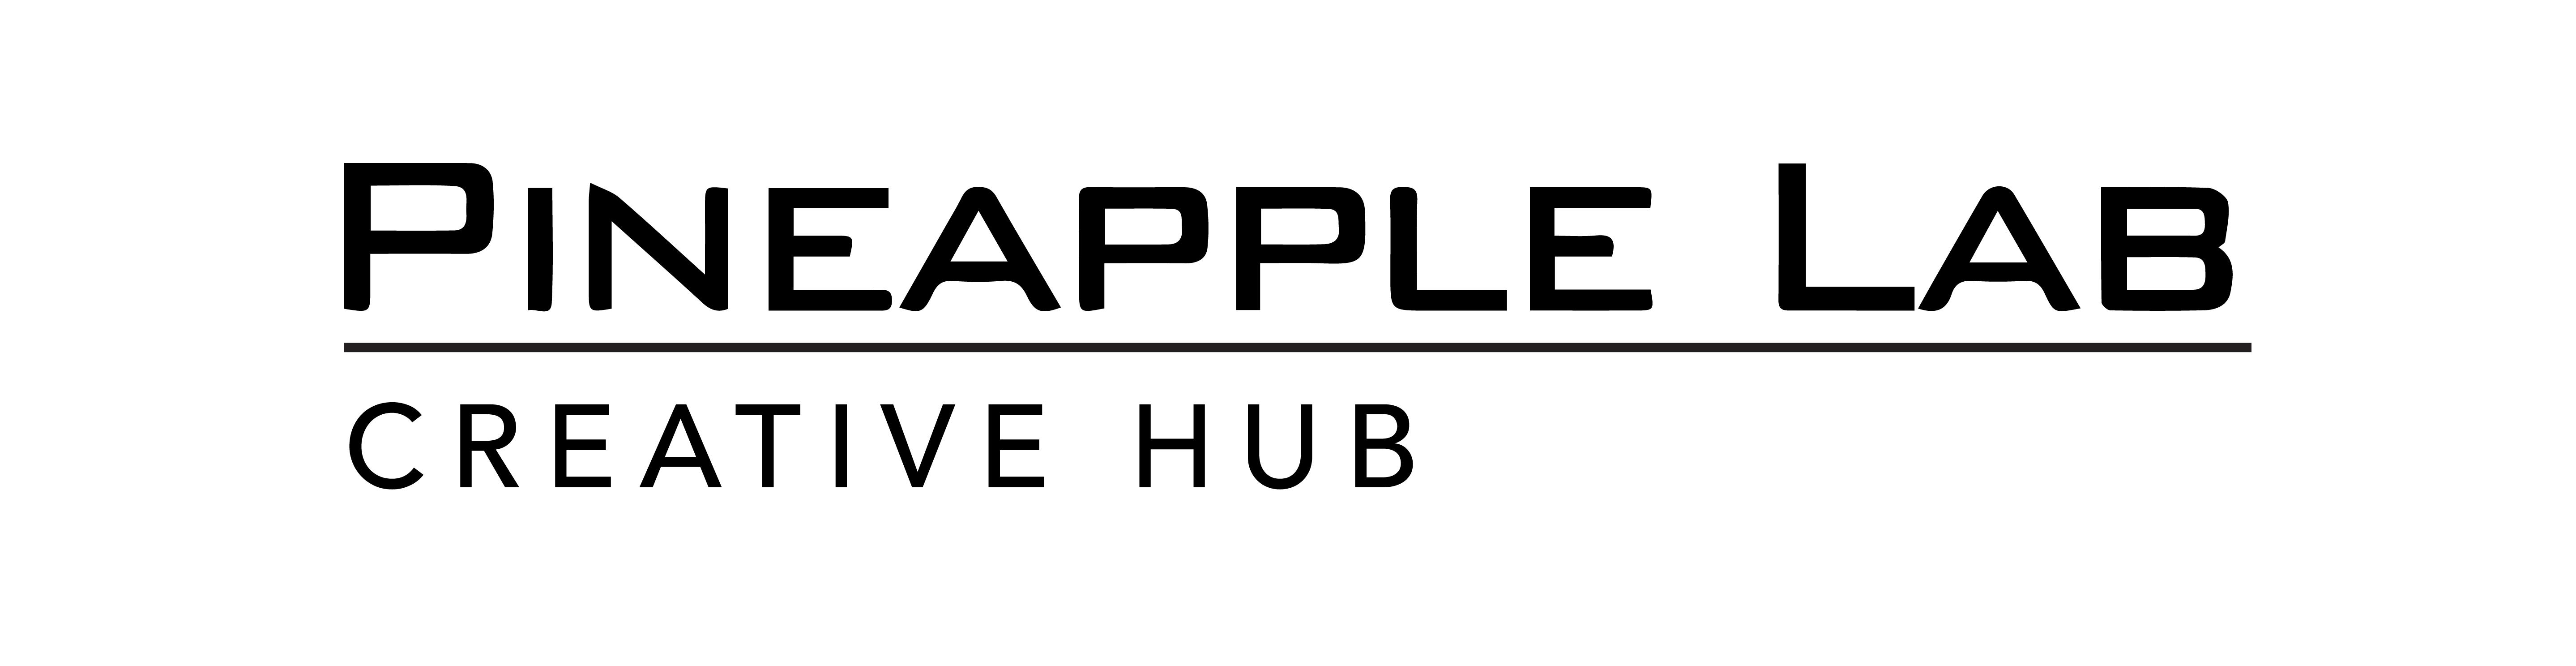 Pineapple Lab logo